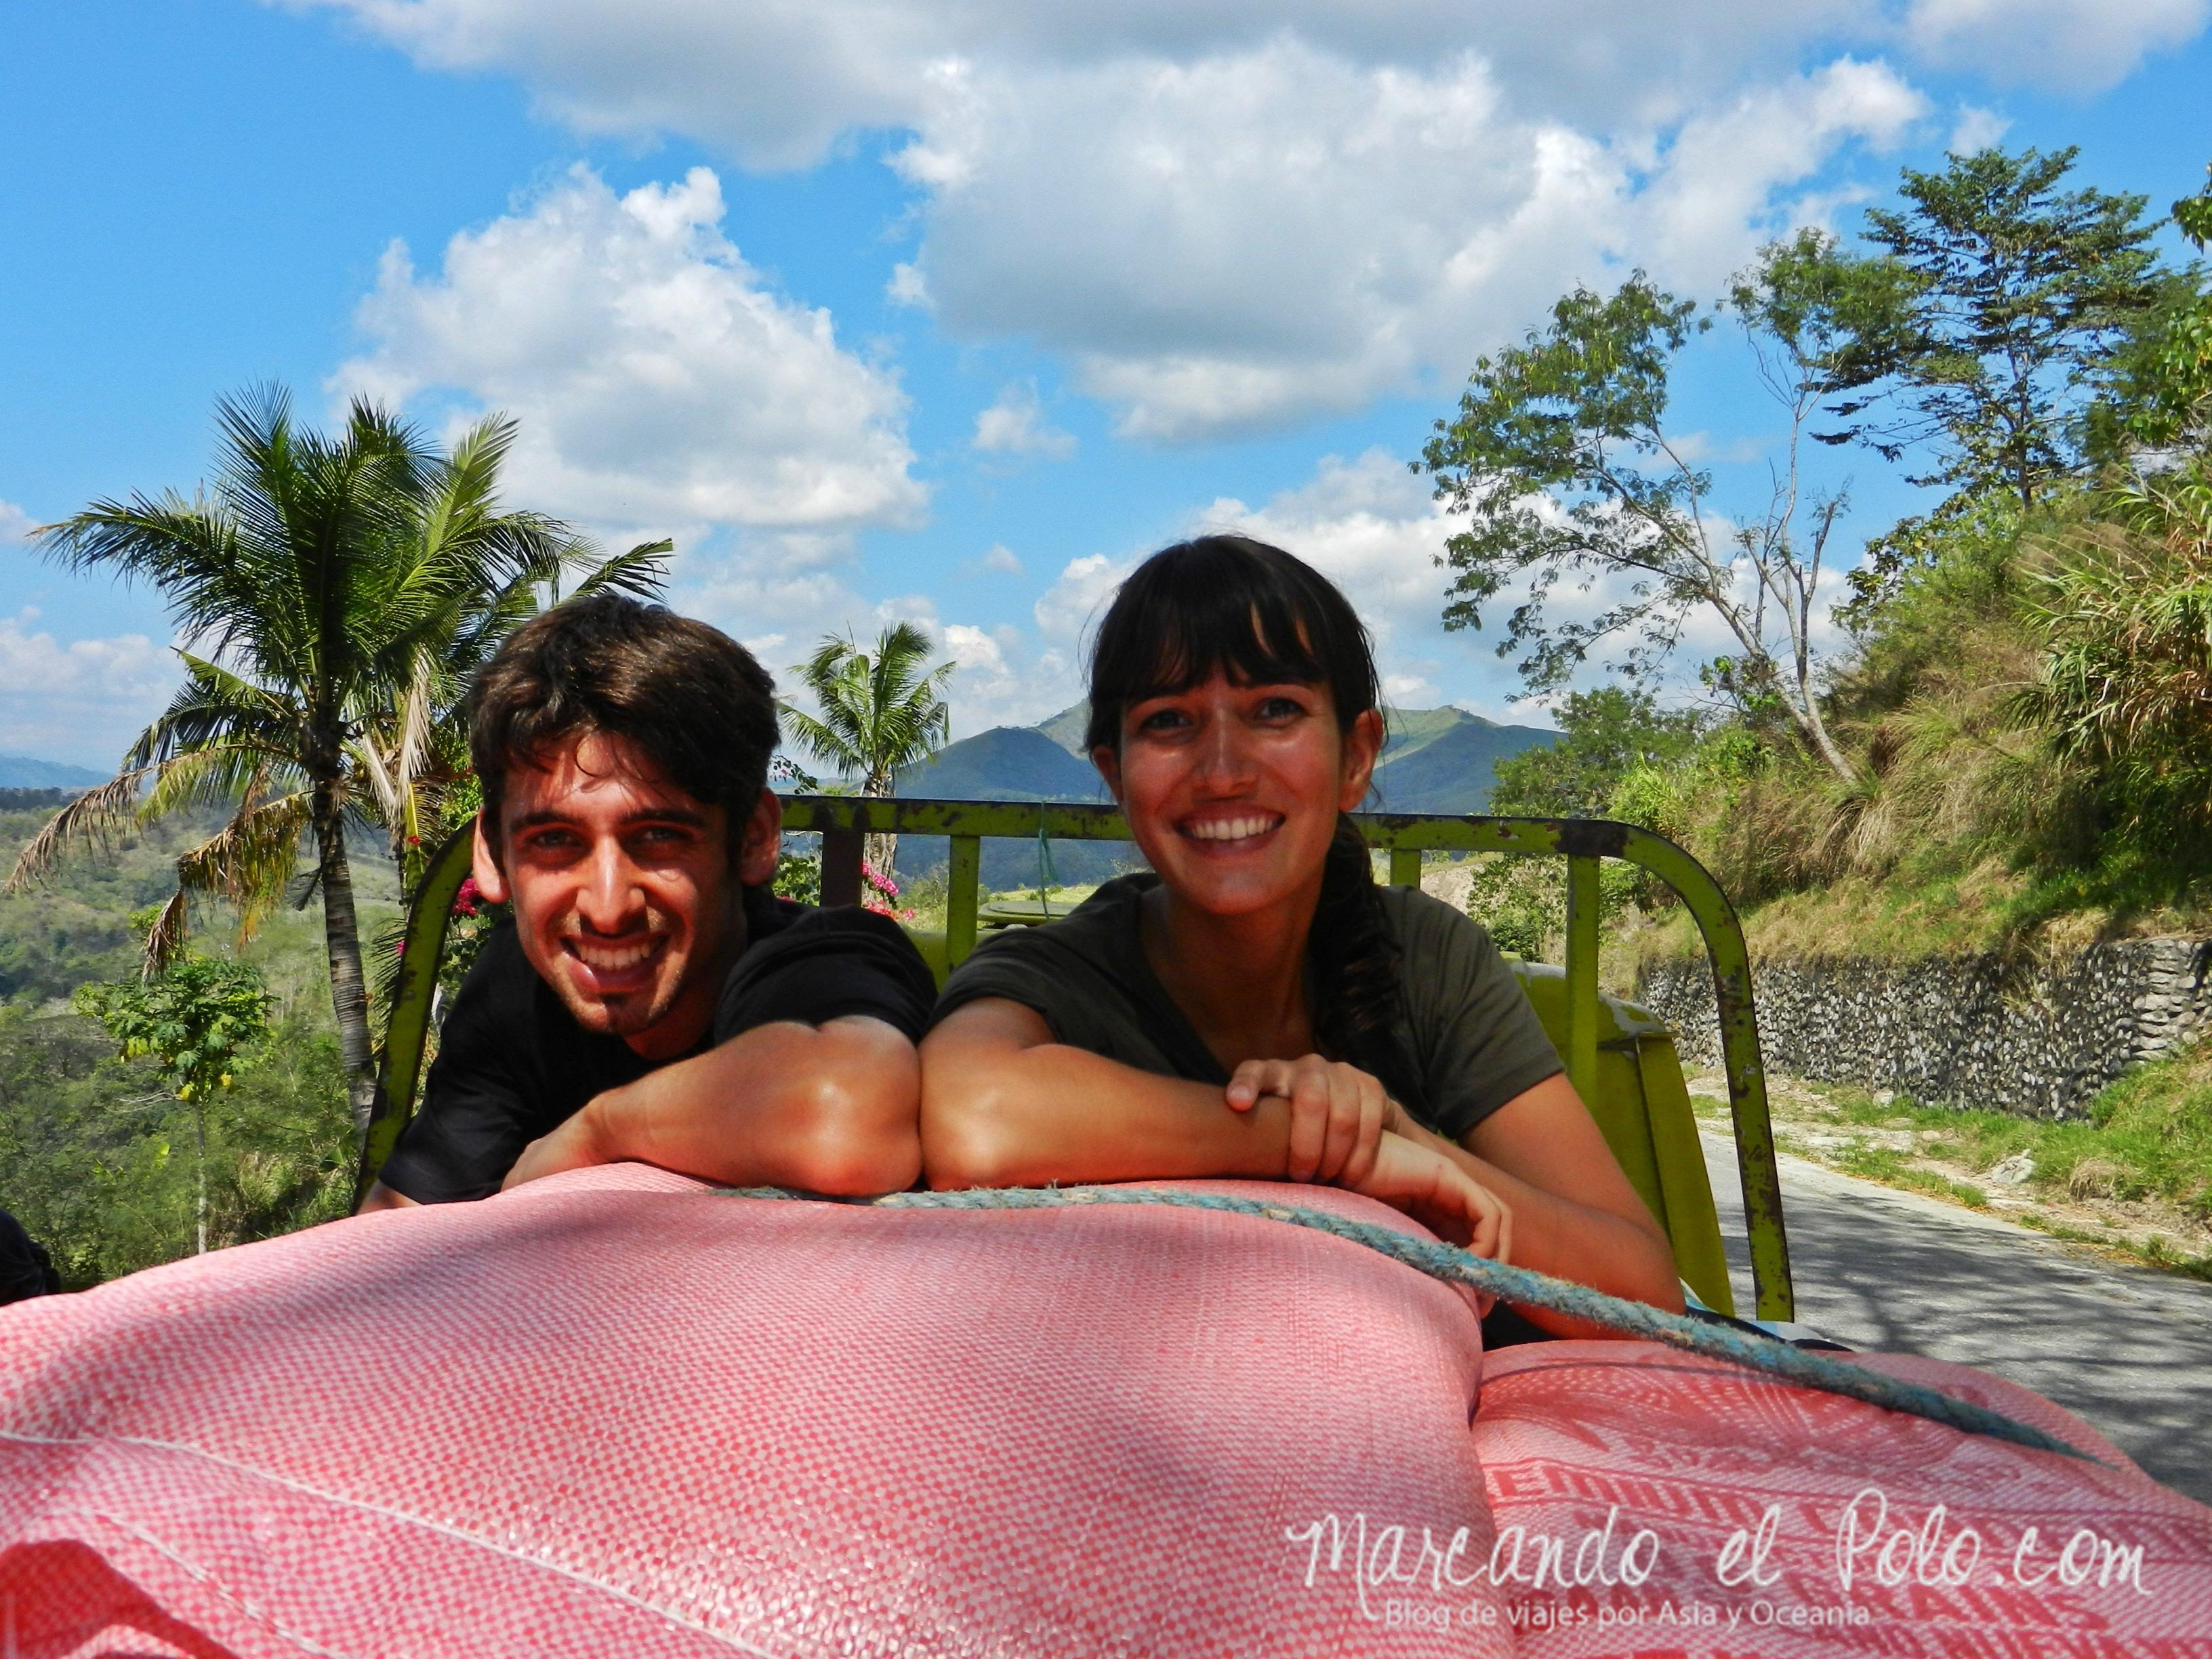 Terrazas de arroz filipinas: Autostop